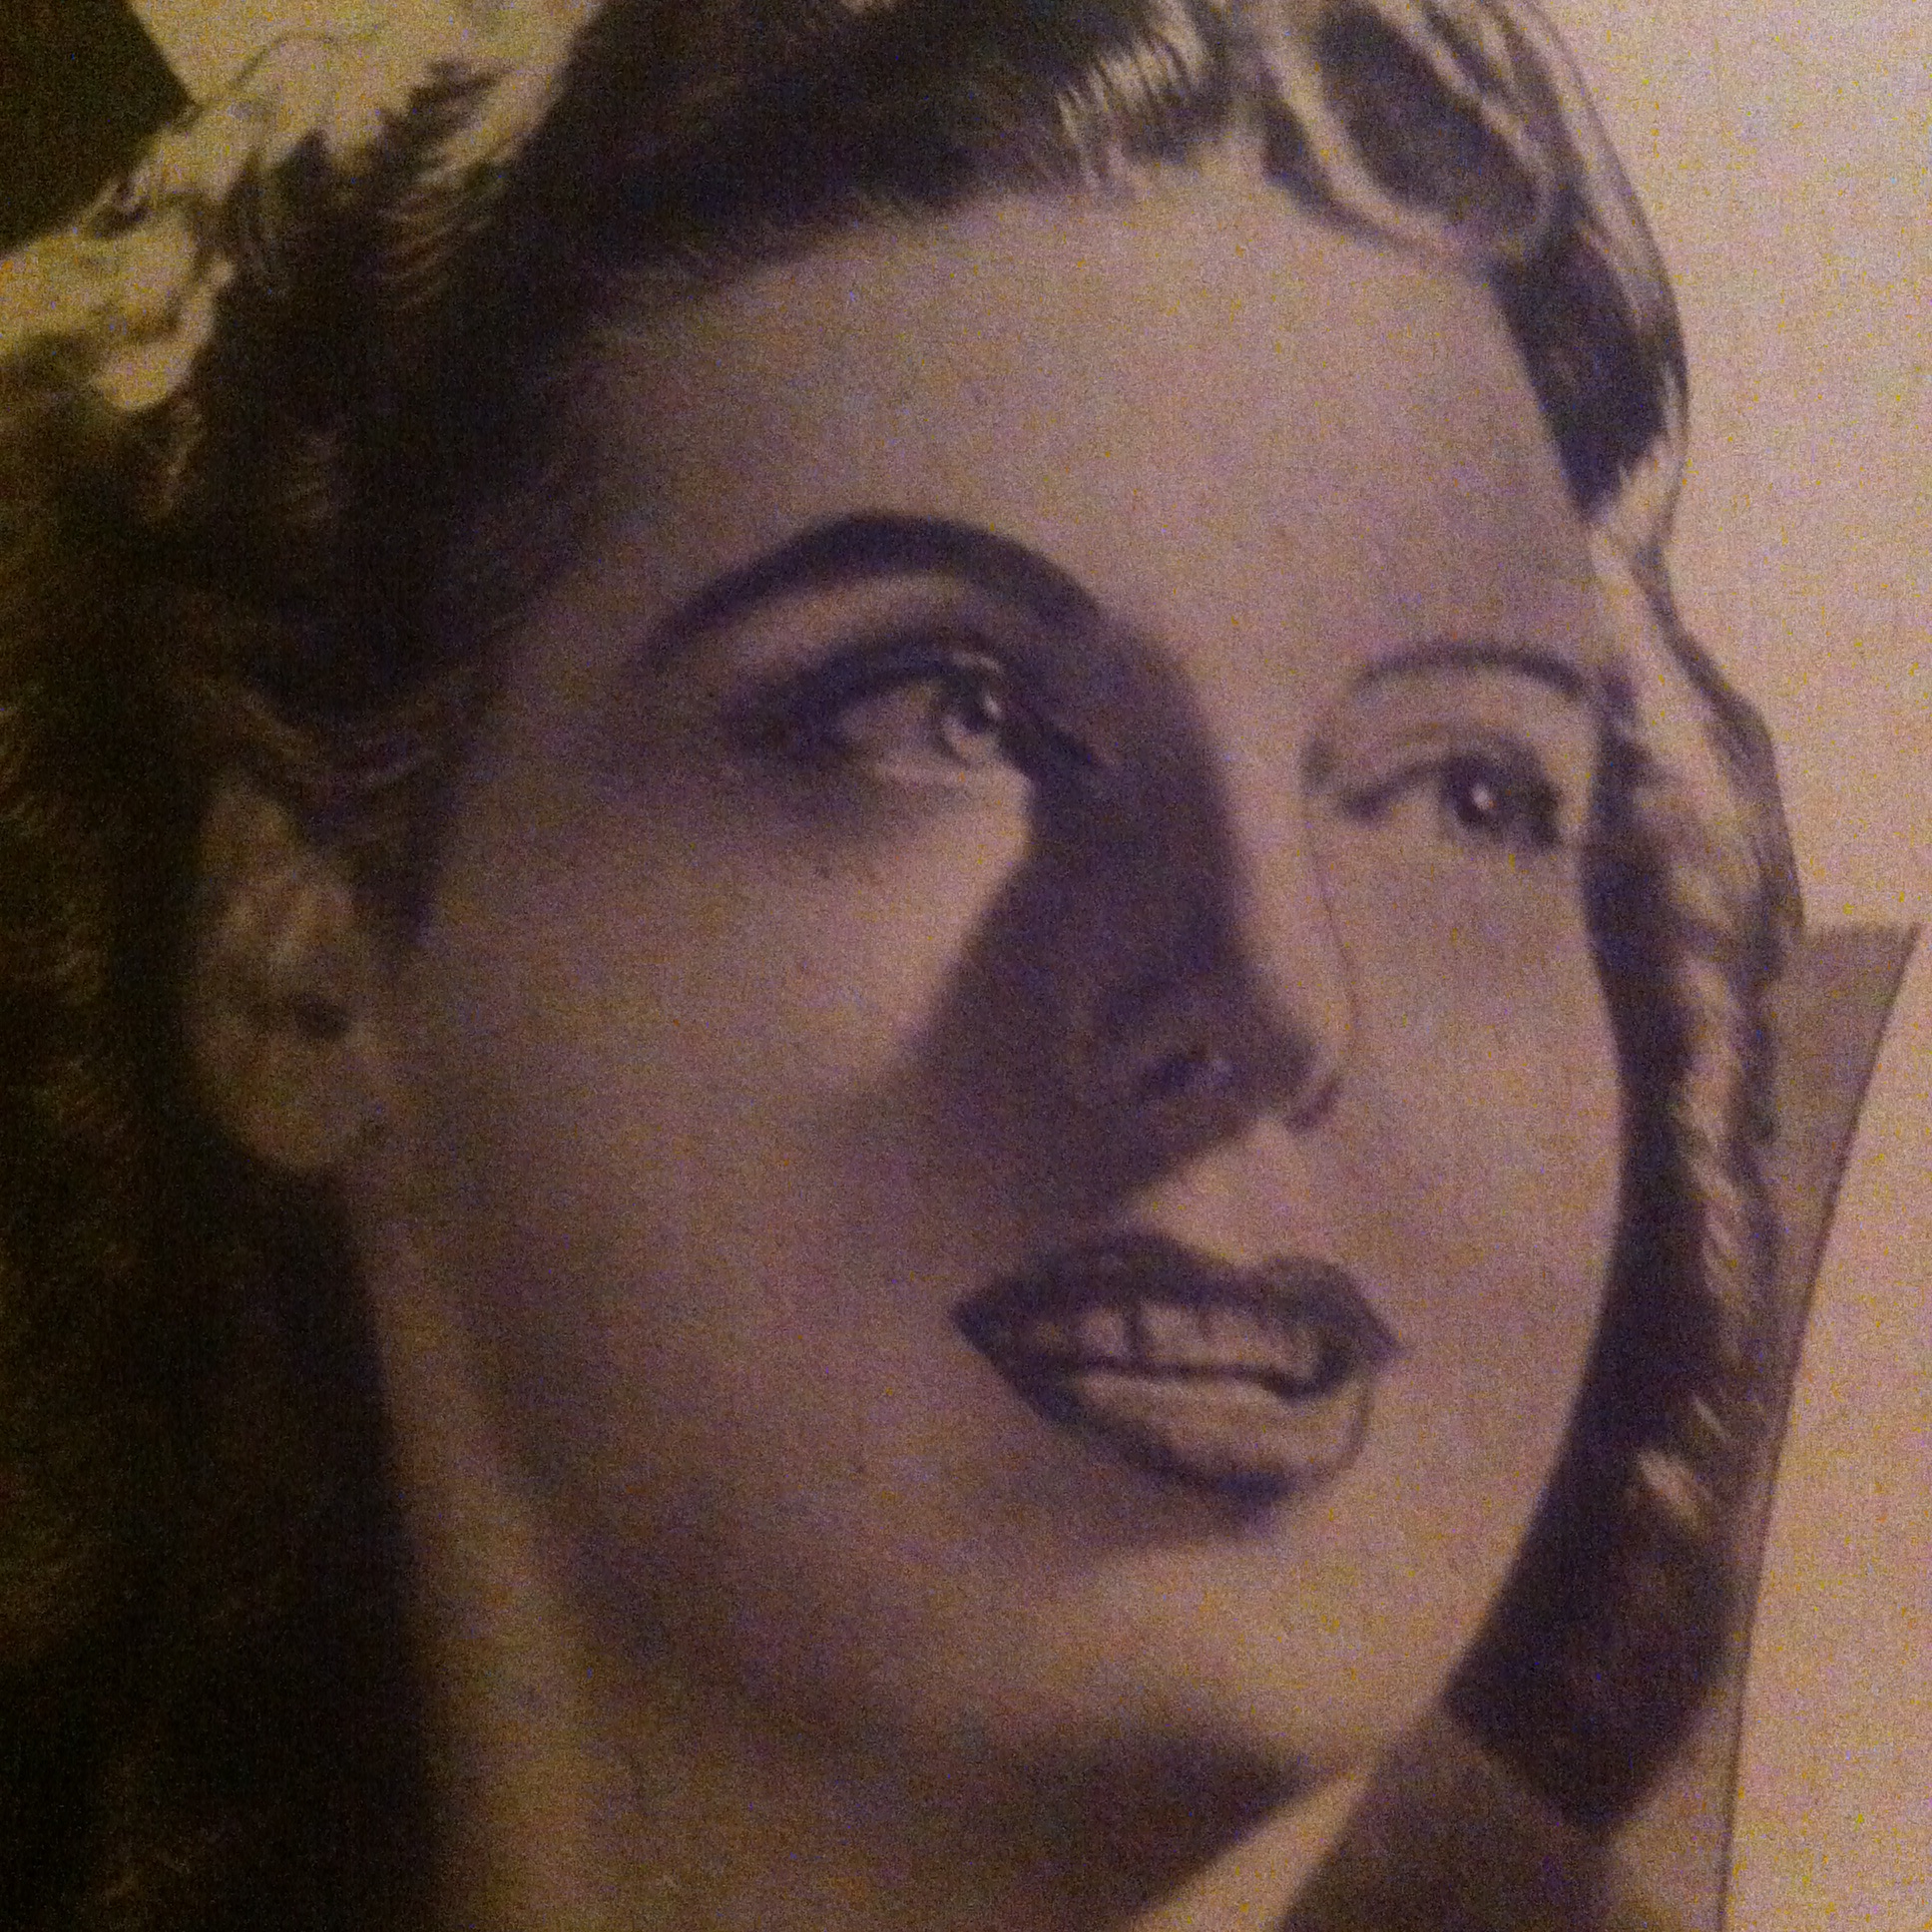 Timotha Lanae,Jessica Marais Adult pics Titina De Filippo (1898?965),Peter Burroughs (born 1947)